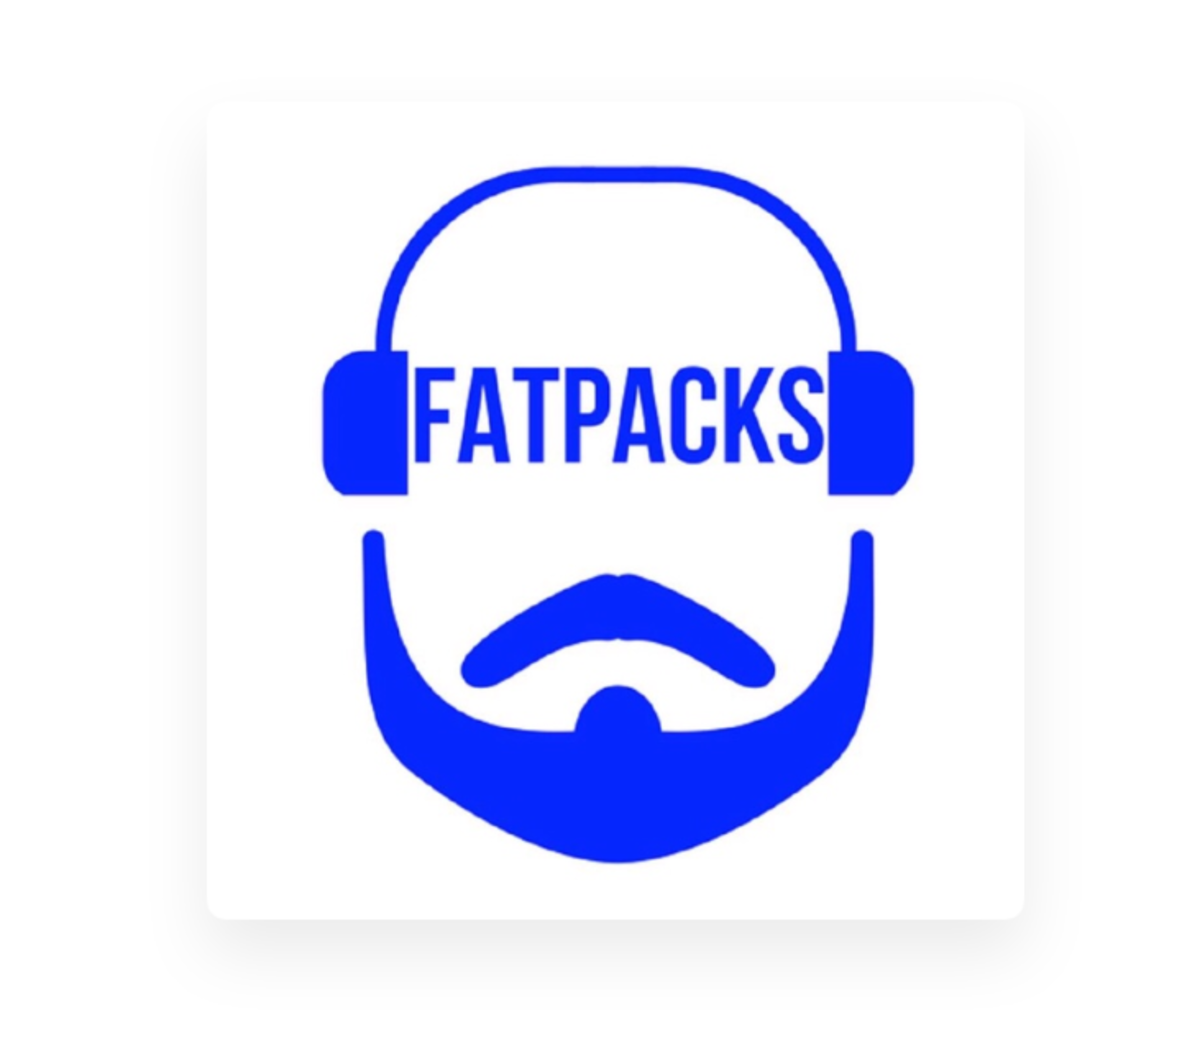 Fat Packs Logo